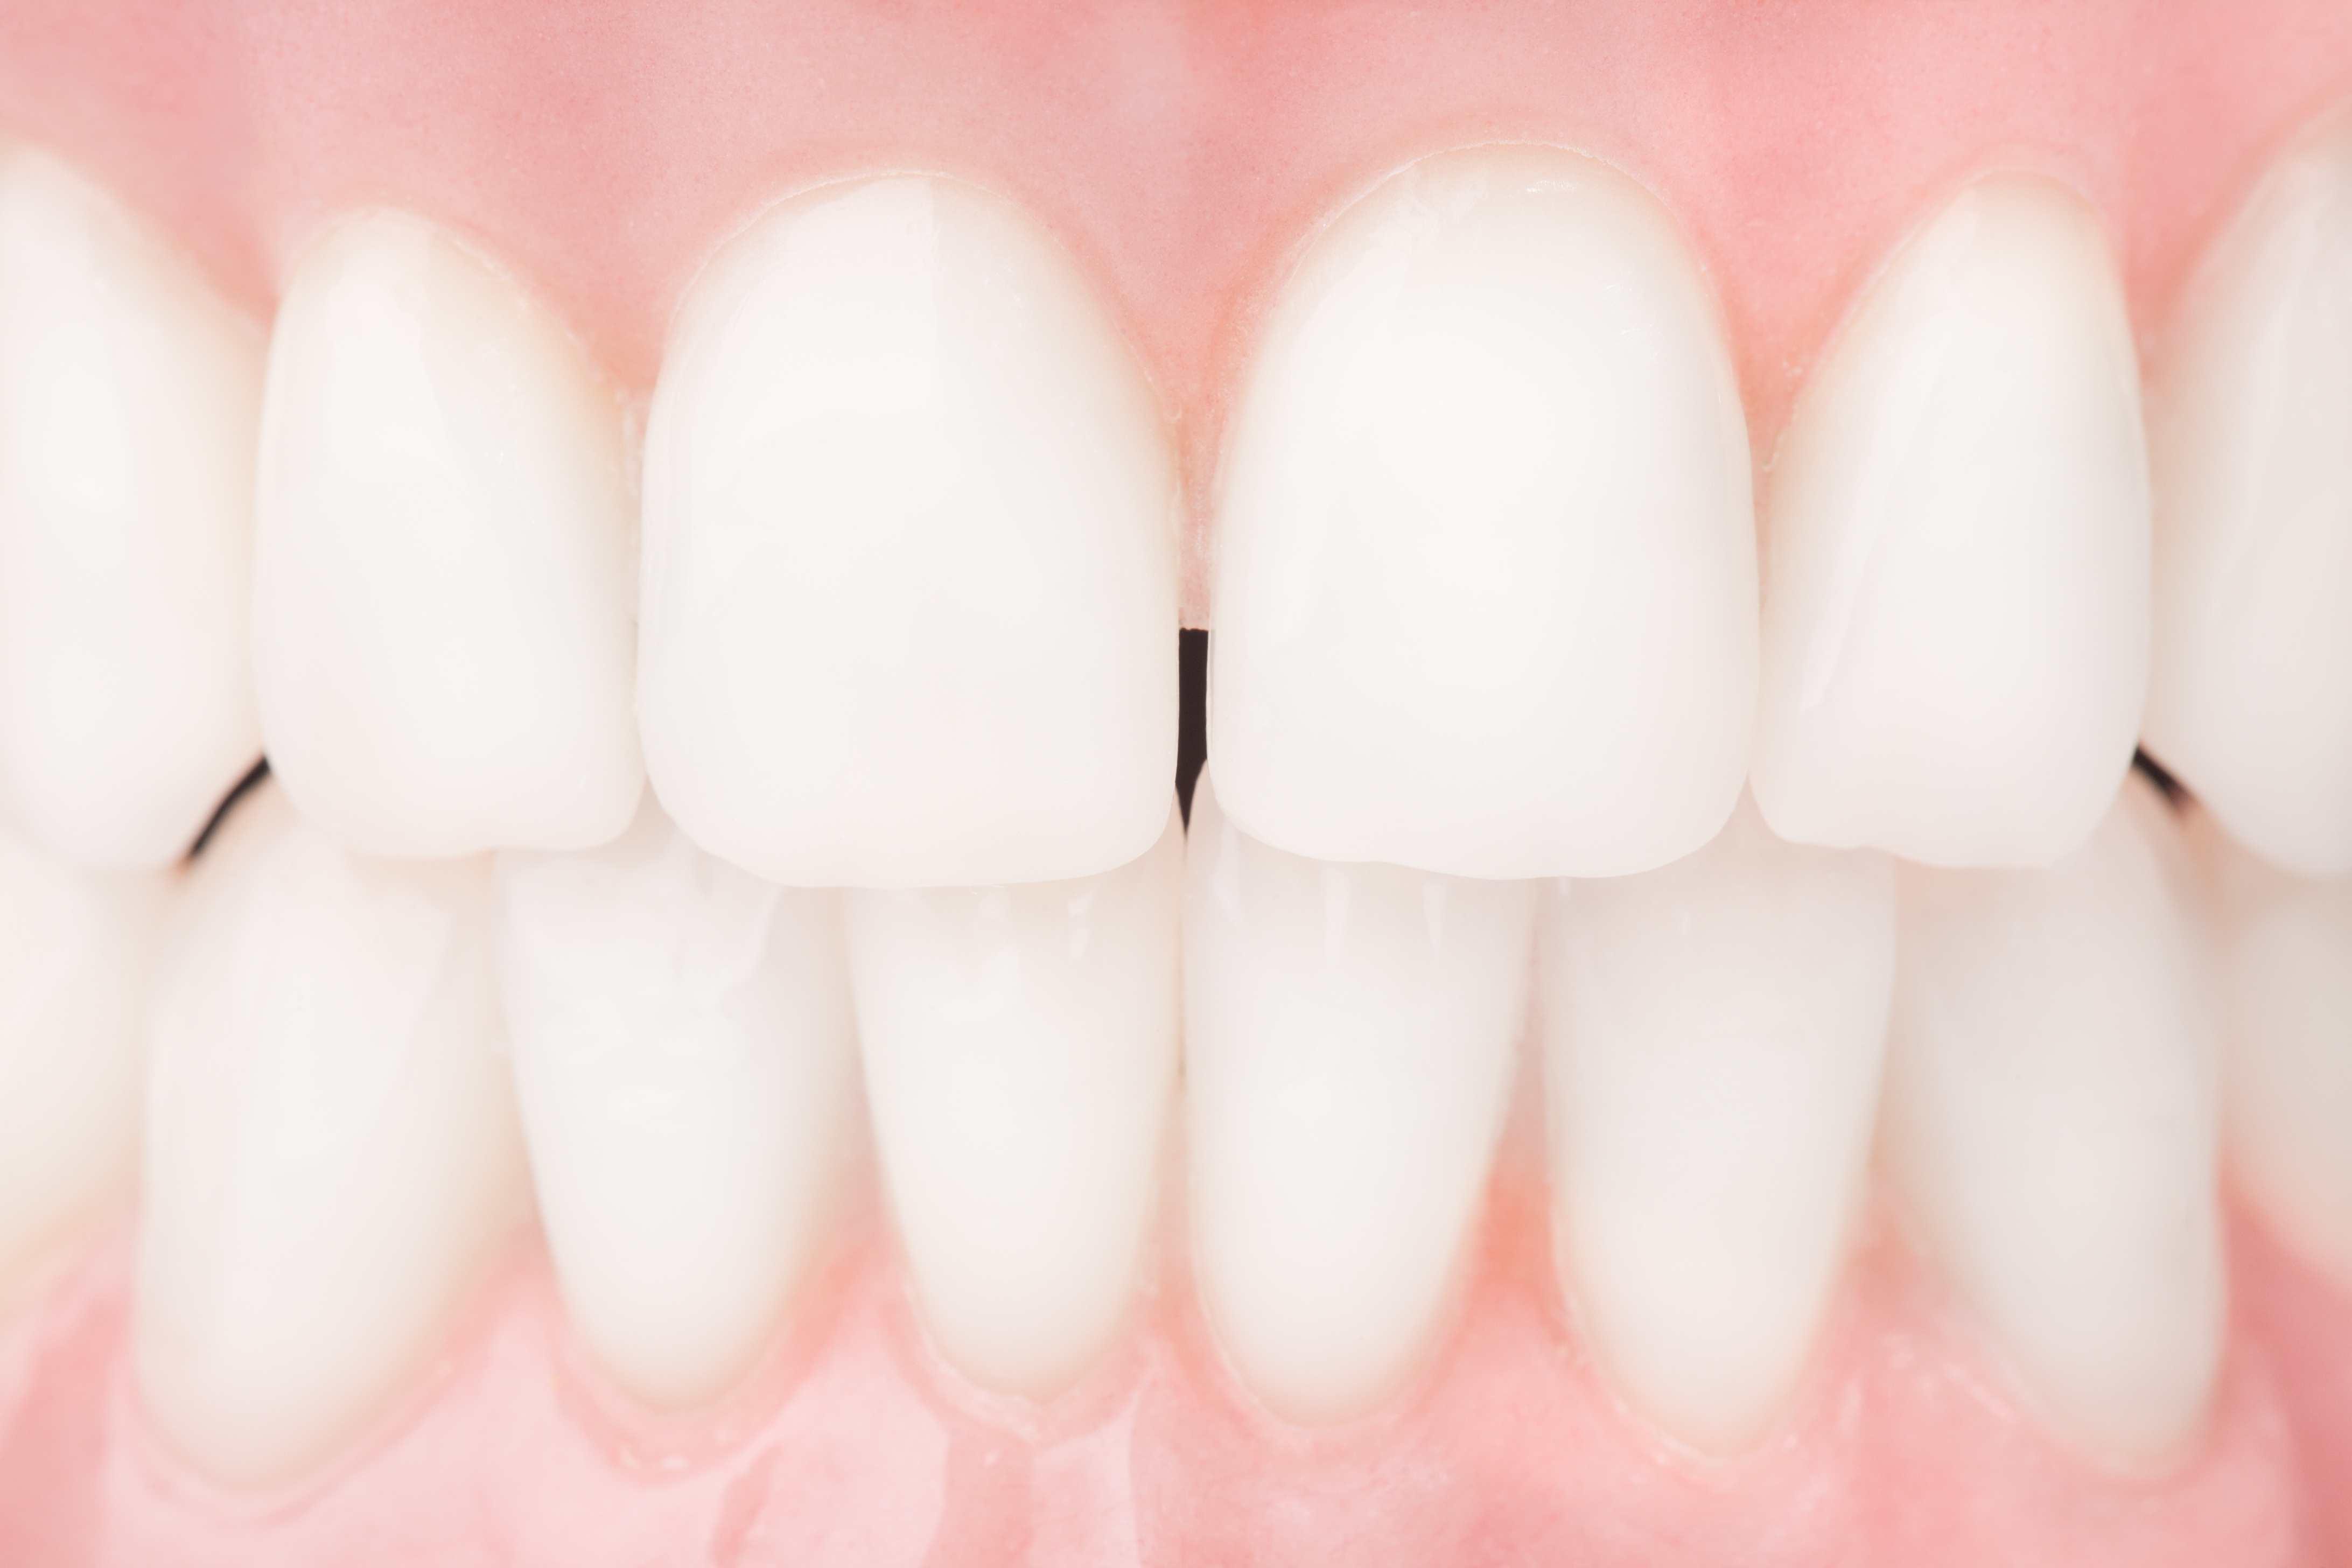 Whitened teeth after dental procedure